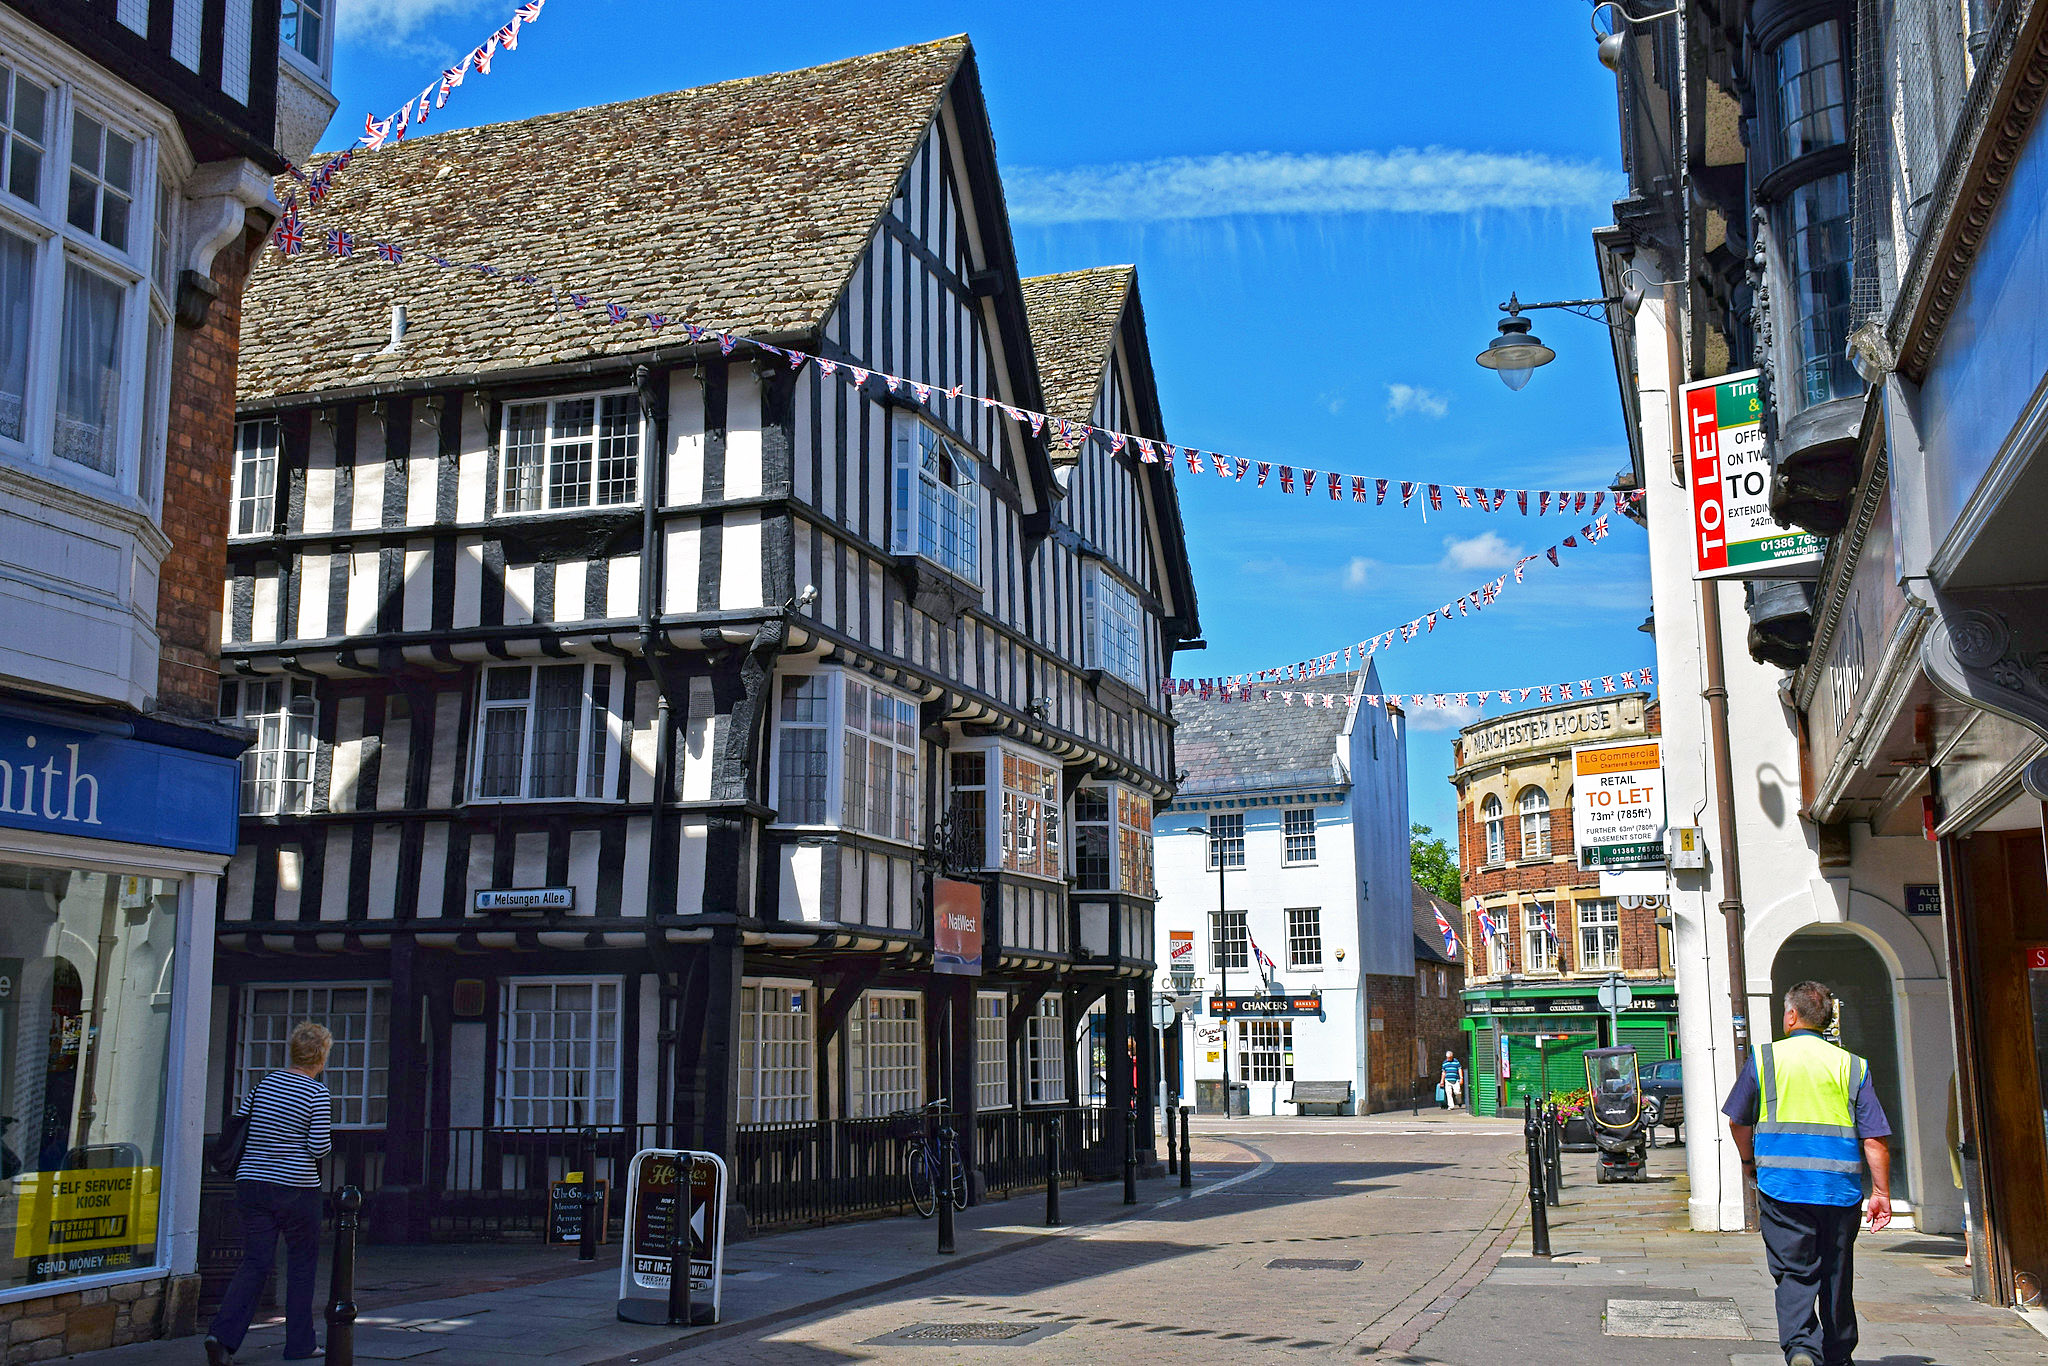 Evesham, Worcestershire by Jainbow.jpg